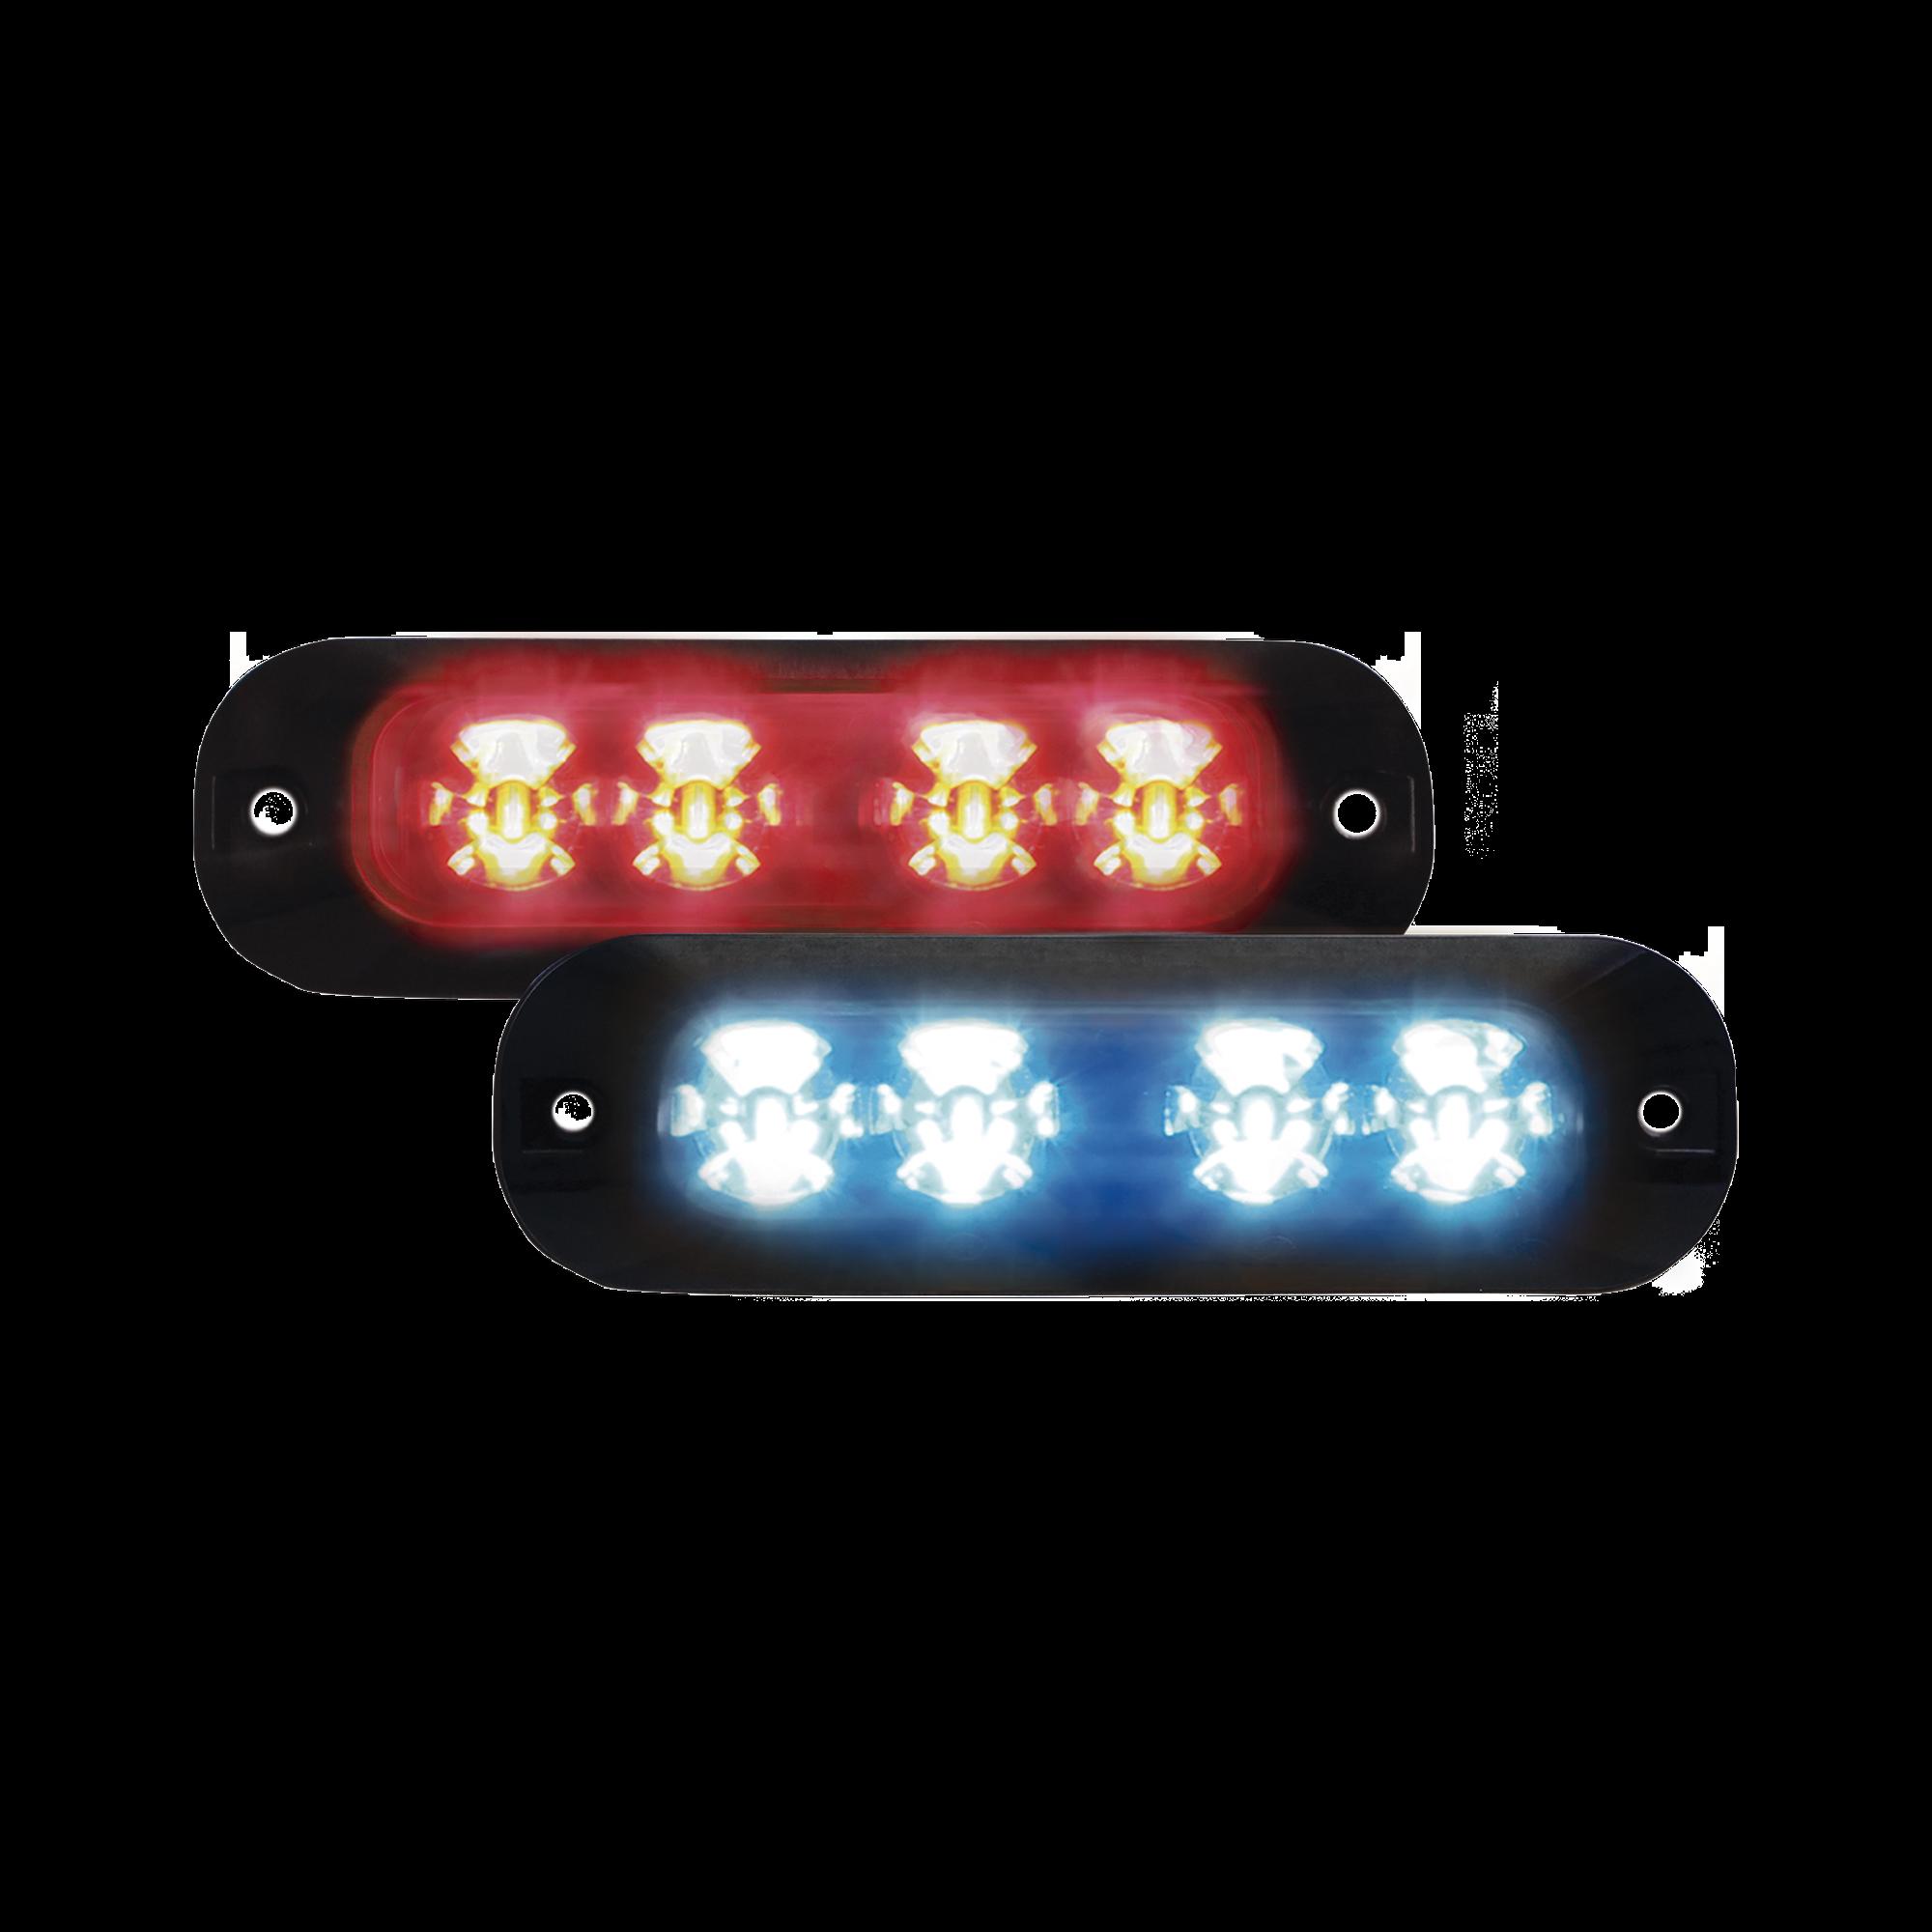 Luz auxiliar con 4 LEDs color rojo-azul